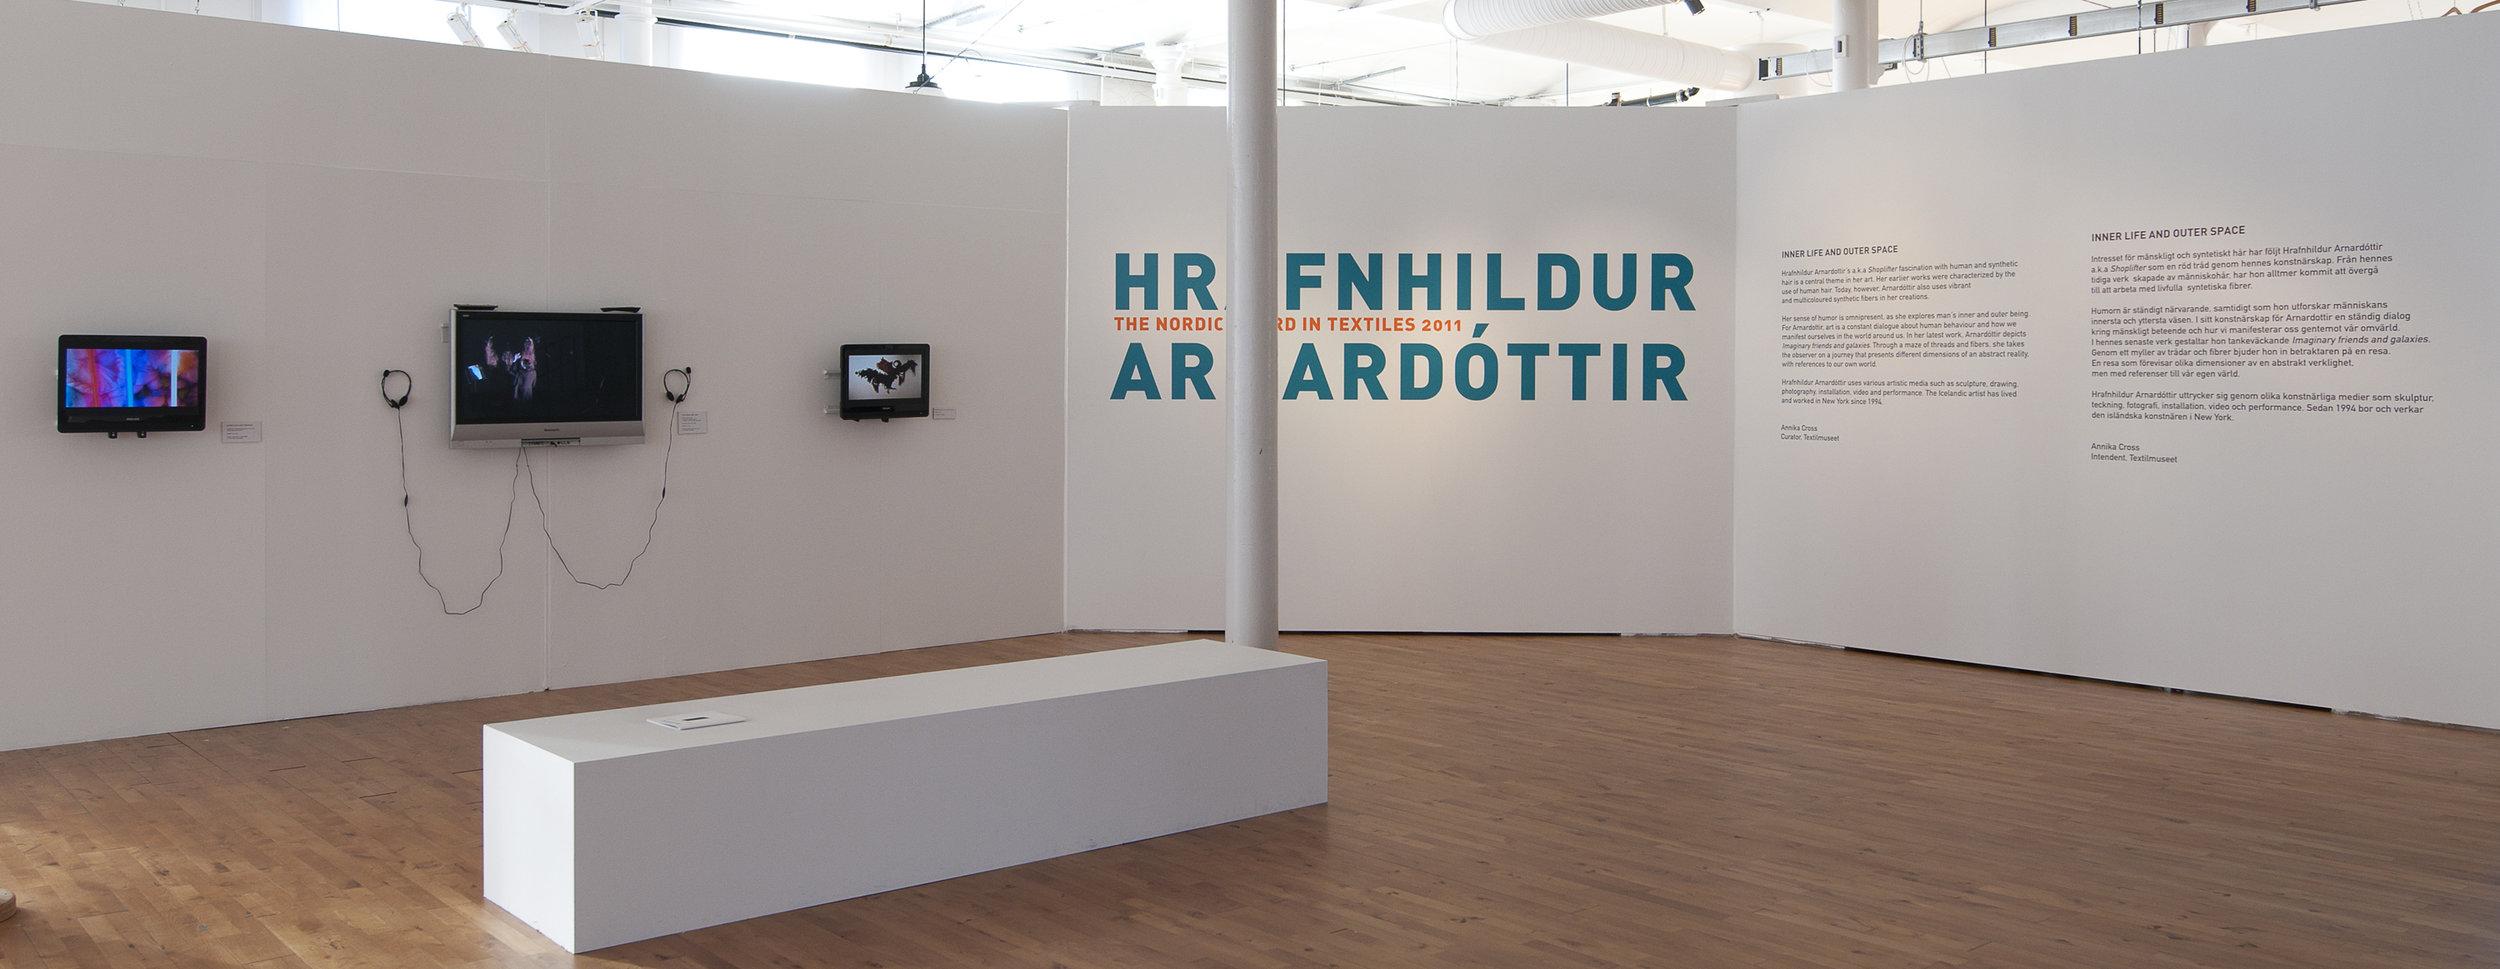 textile-museum-installation-view_hrafnihldur-arnardottir-aka-shoplifter_2011_jan-berg_300dpi_DSC4969.jpg